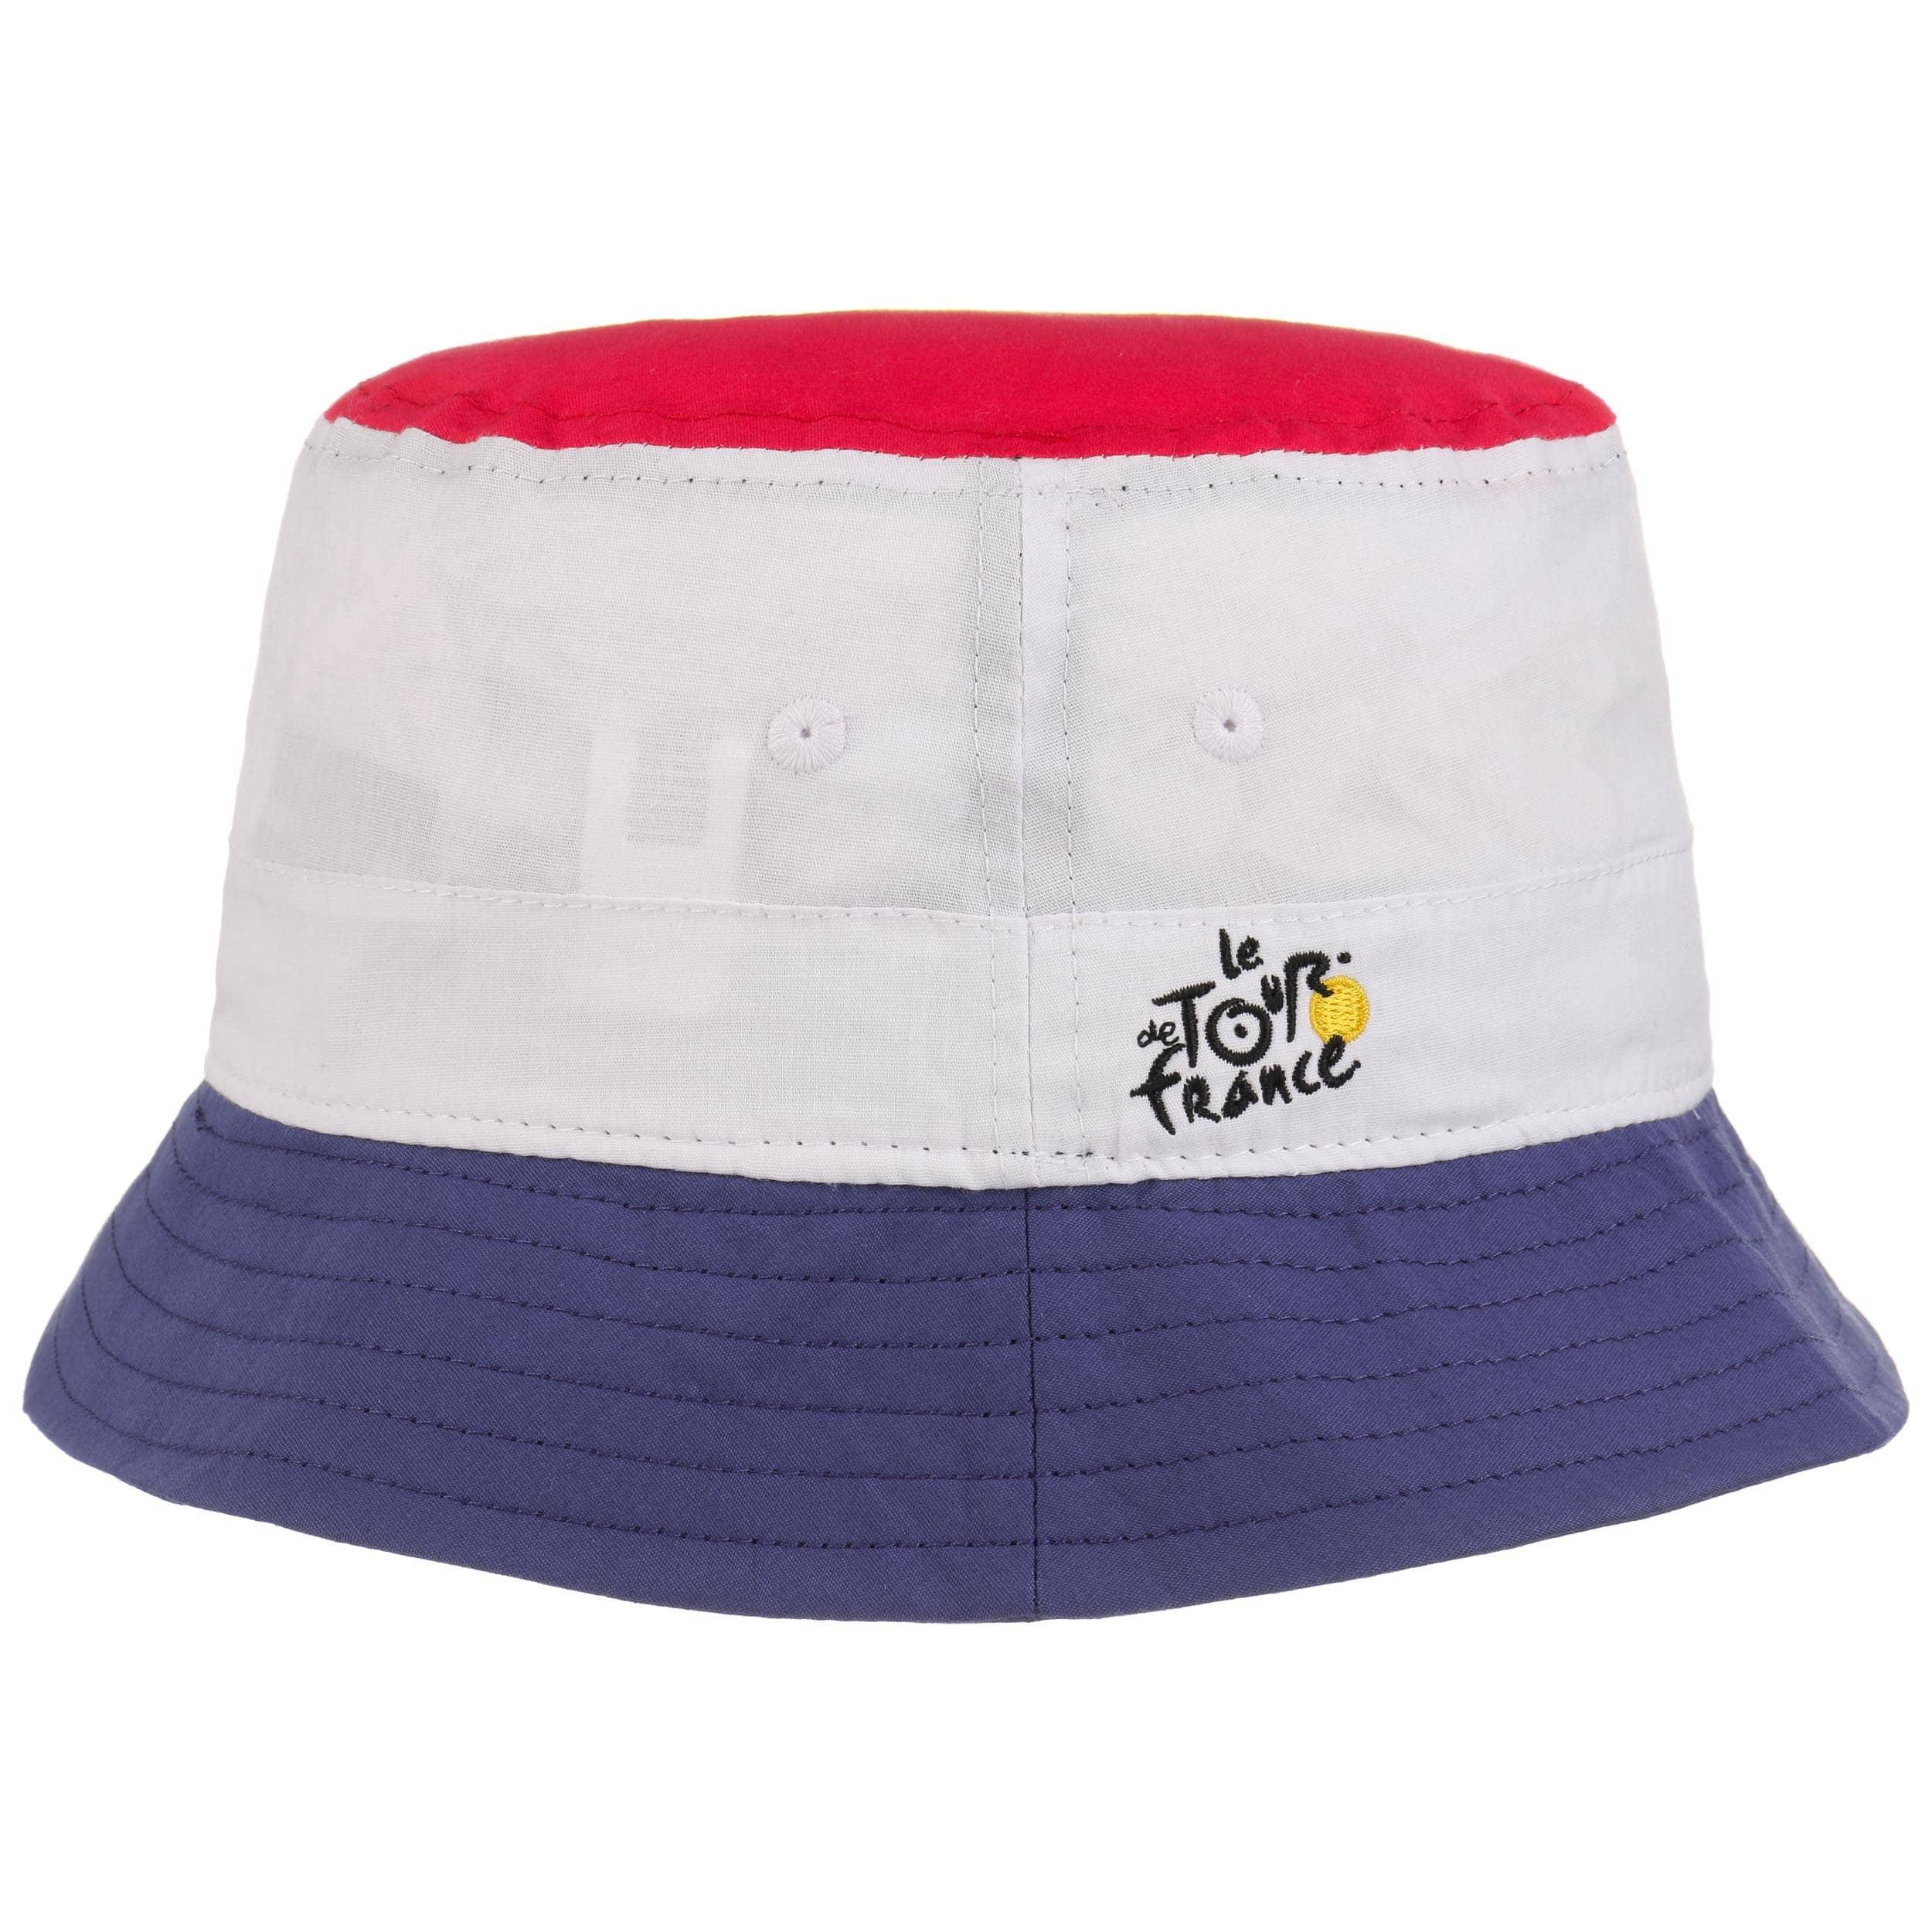 Sombrero de Tela Tour De France by New Era - Sombreros - sombreroshop.es 23c58d17302